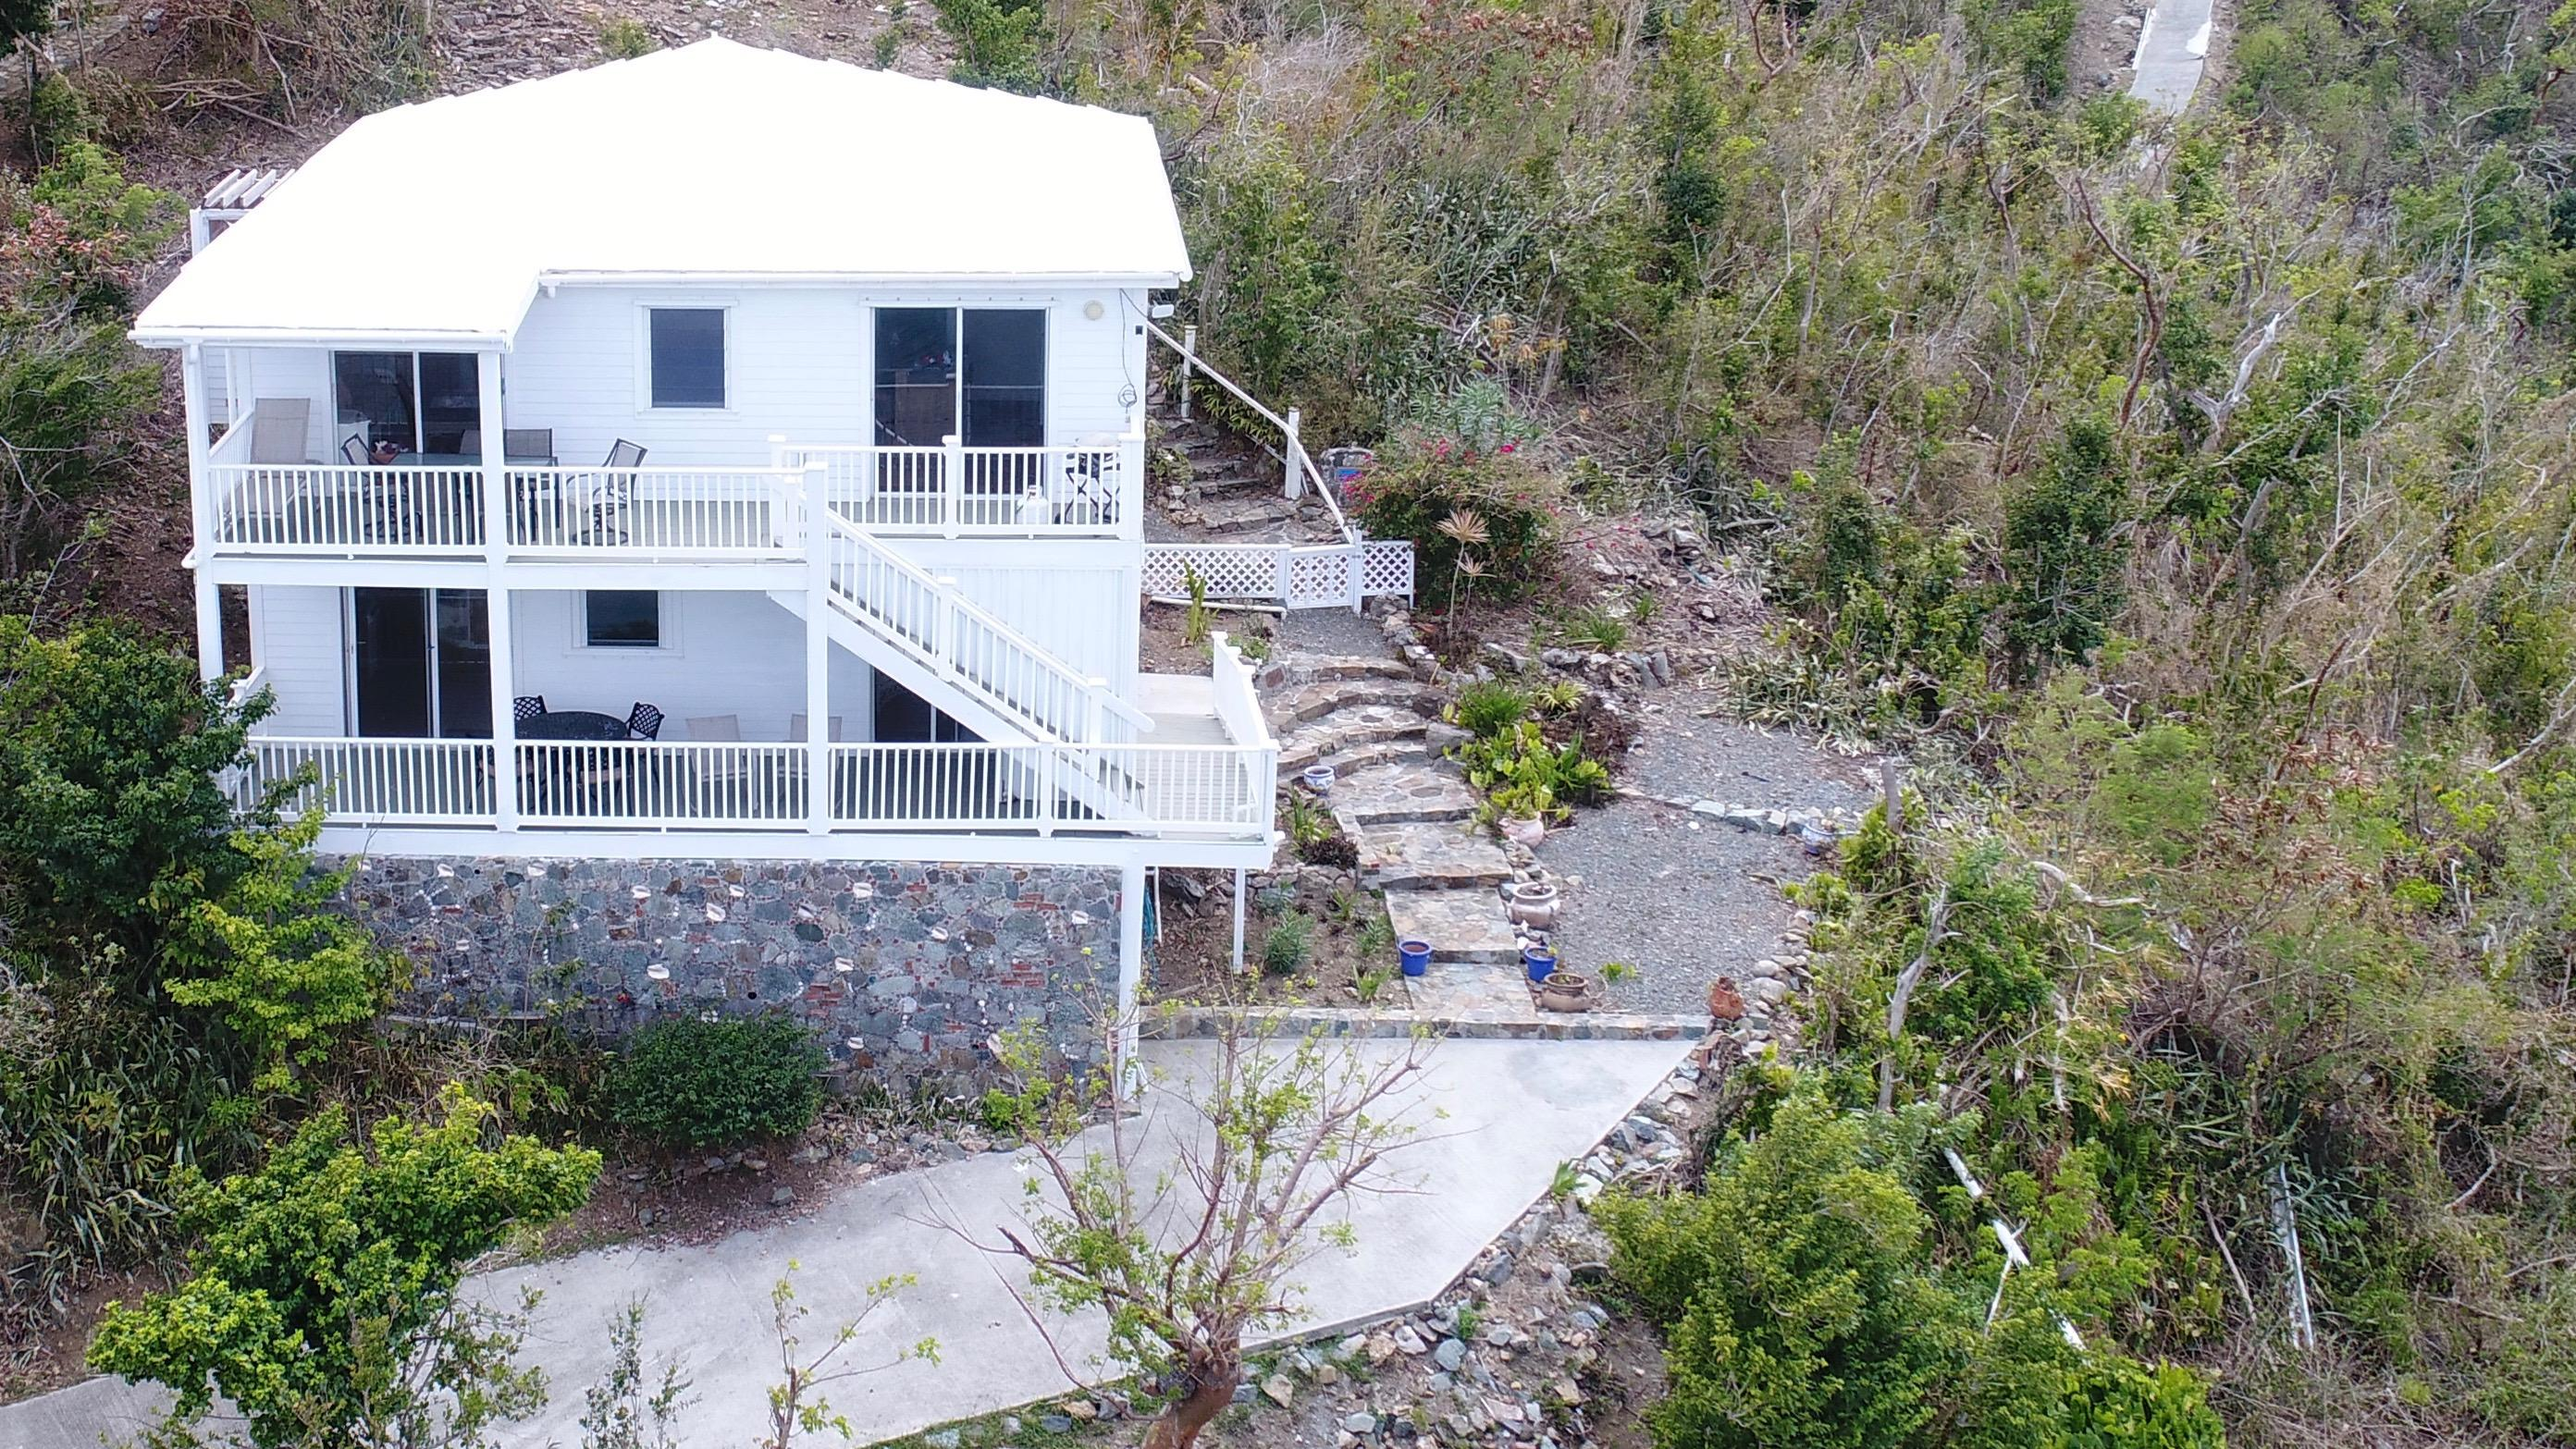 St John, Virgin Islands 00830, 3 Bedrooms Bedrooms, ,3 BathroomsBathrooms,Residential,For Sale,18-84